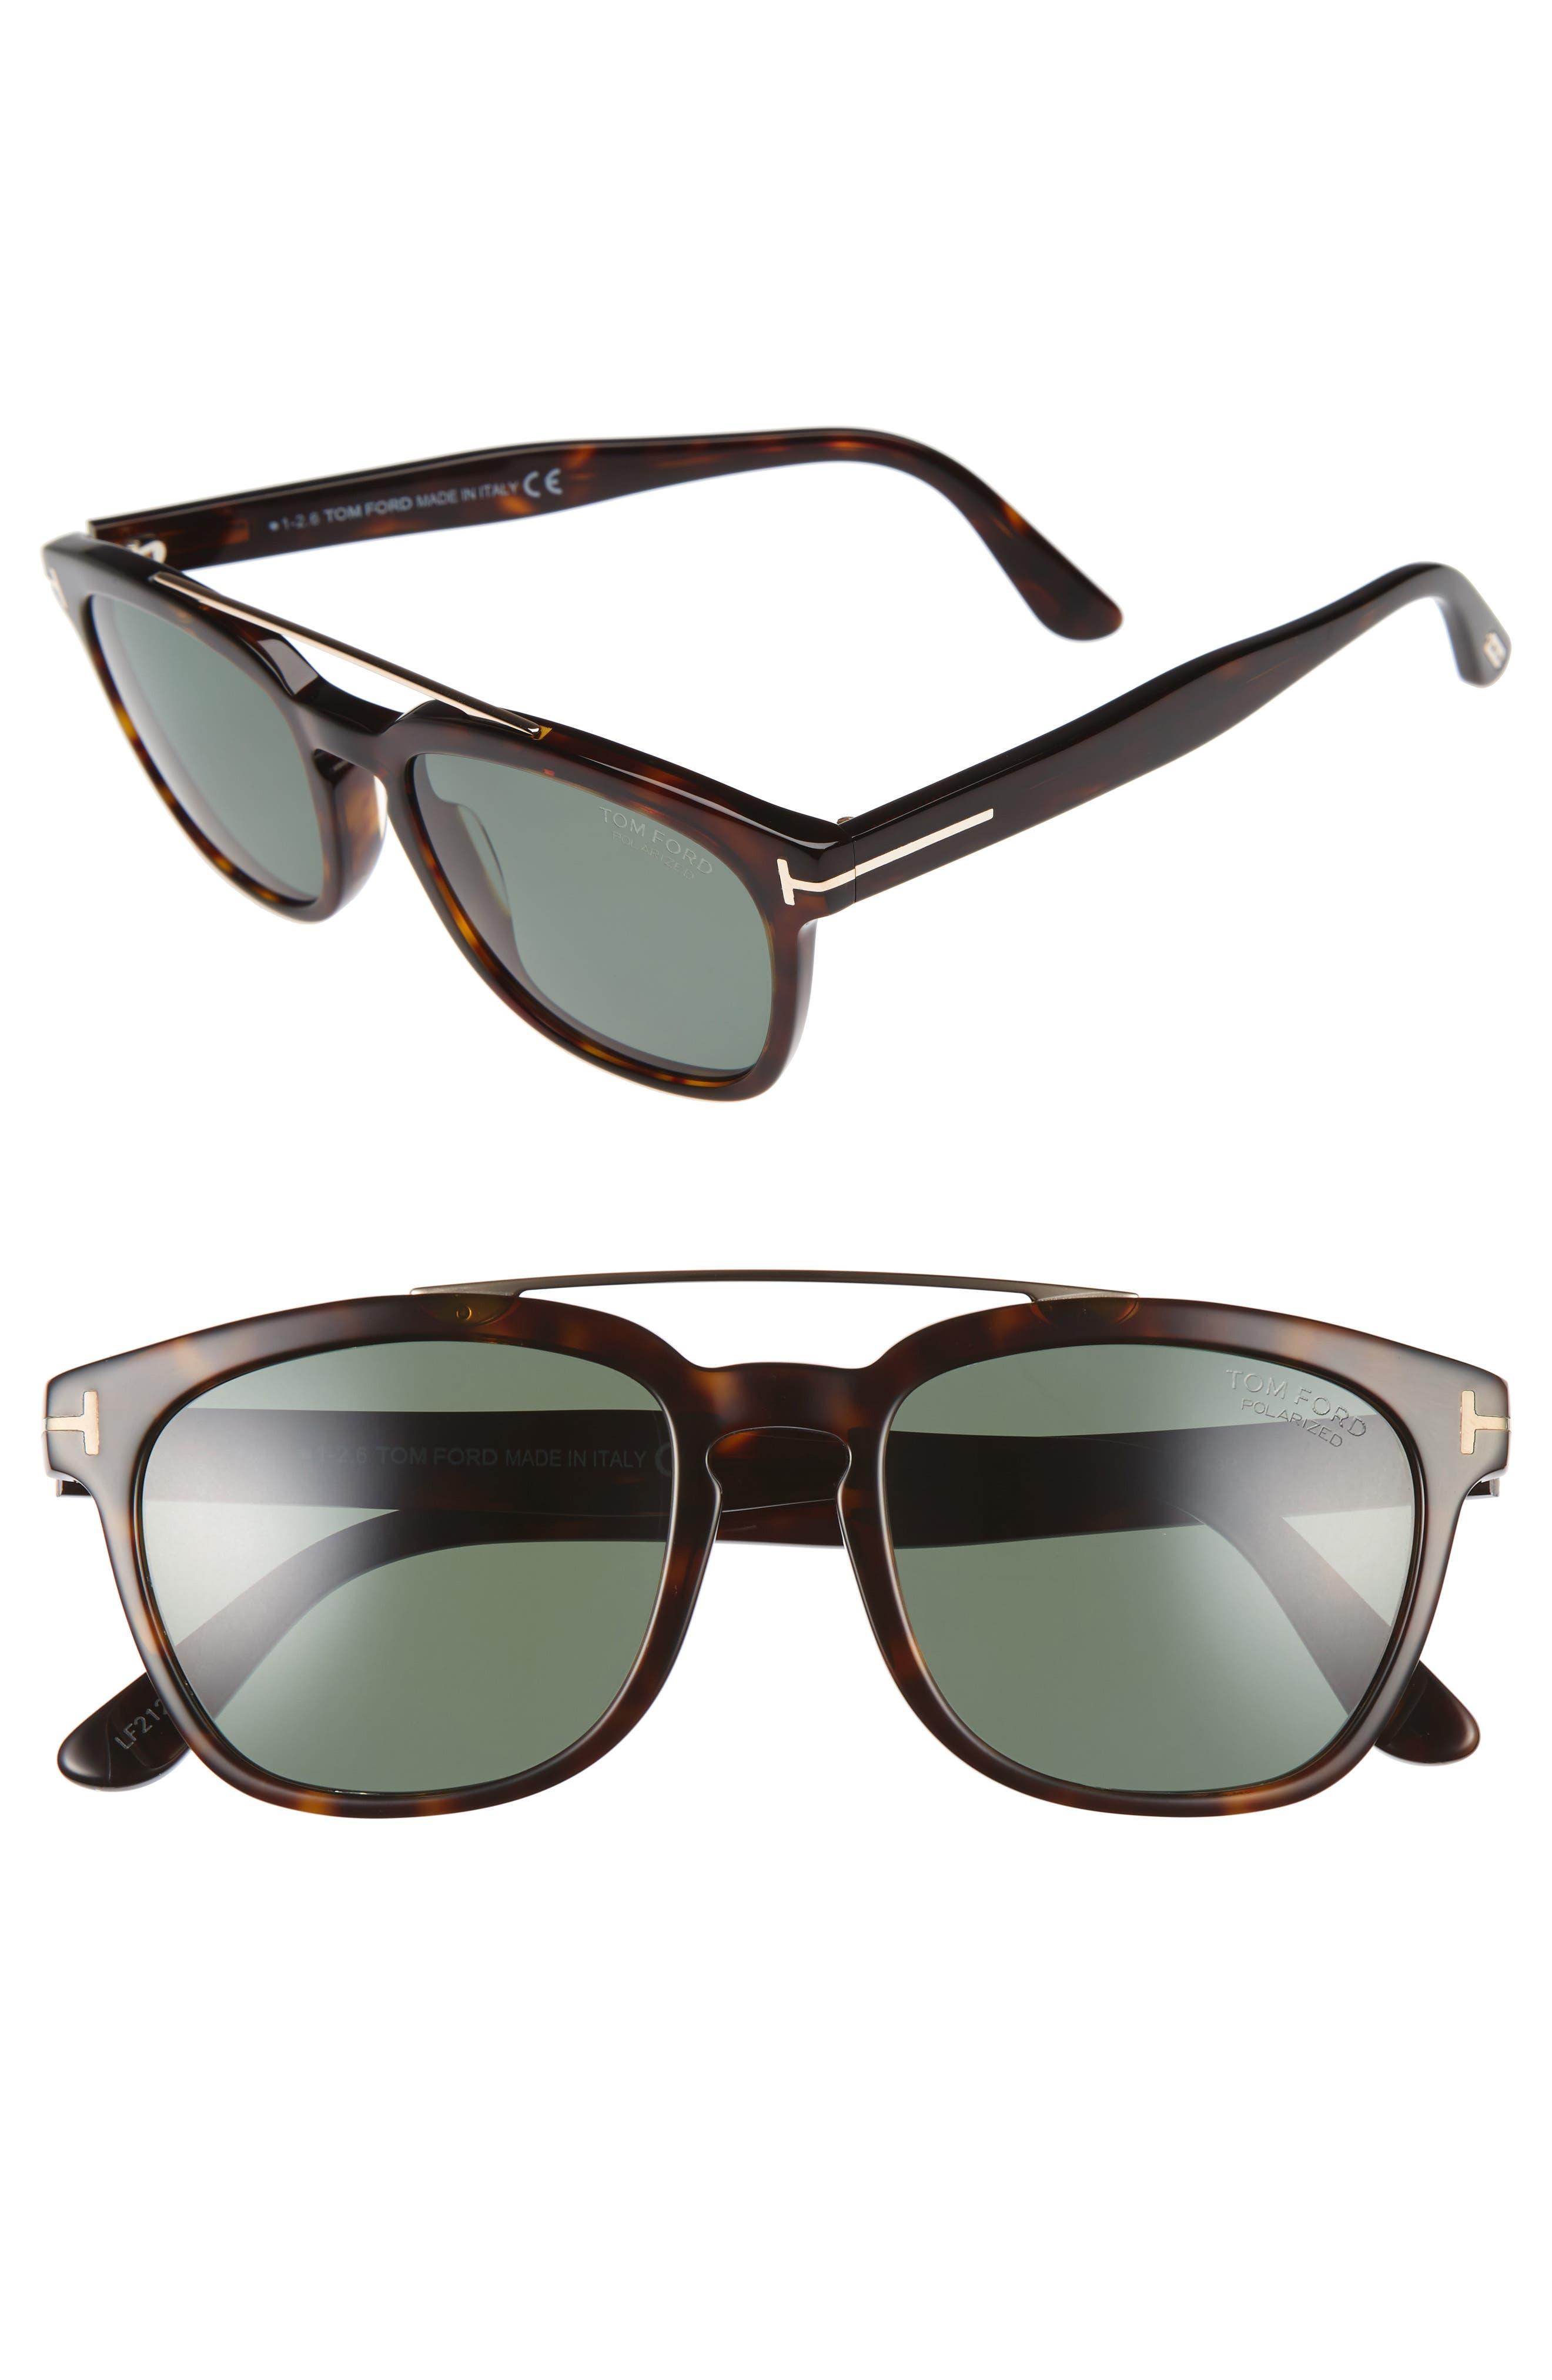 TOM FORD Holt 54mm Polarized Sunglasses